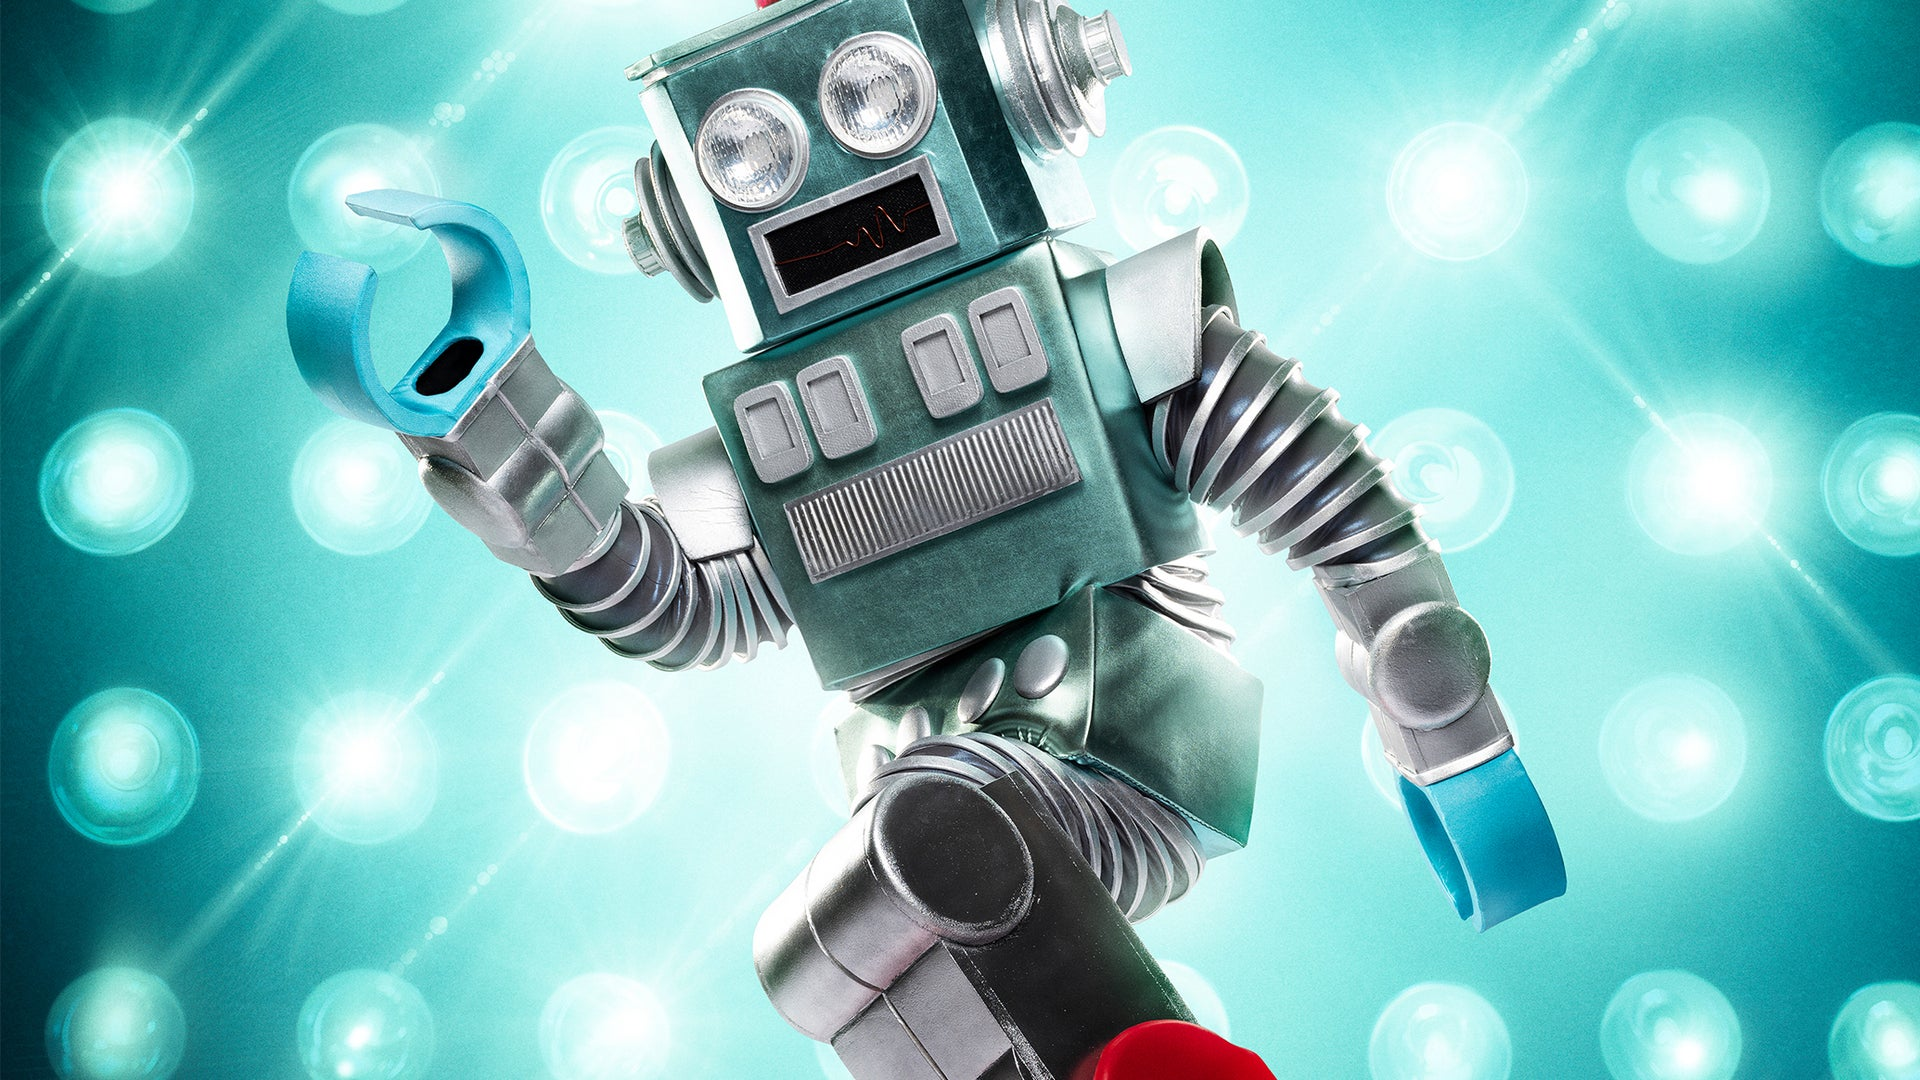 The Robot, The Masked Singer Season 3